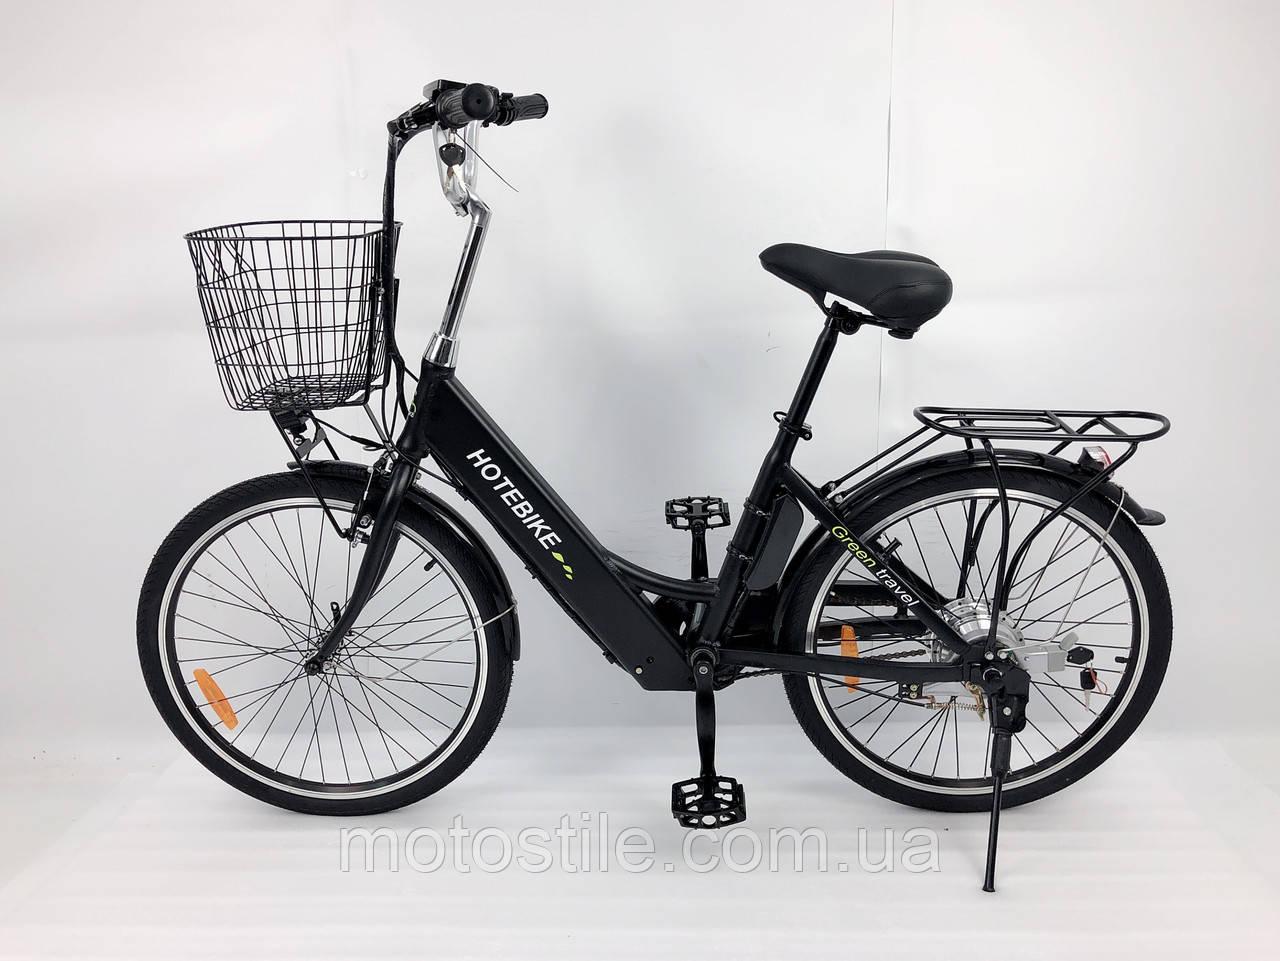 Электровелосипед 350Вт АКБ36V10AH